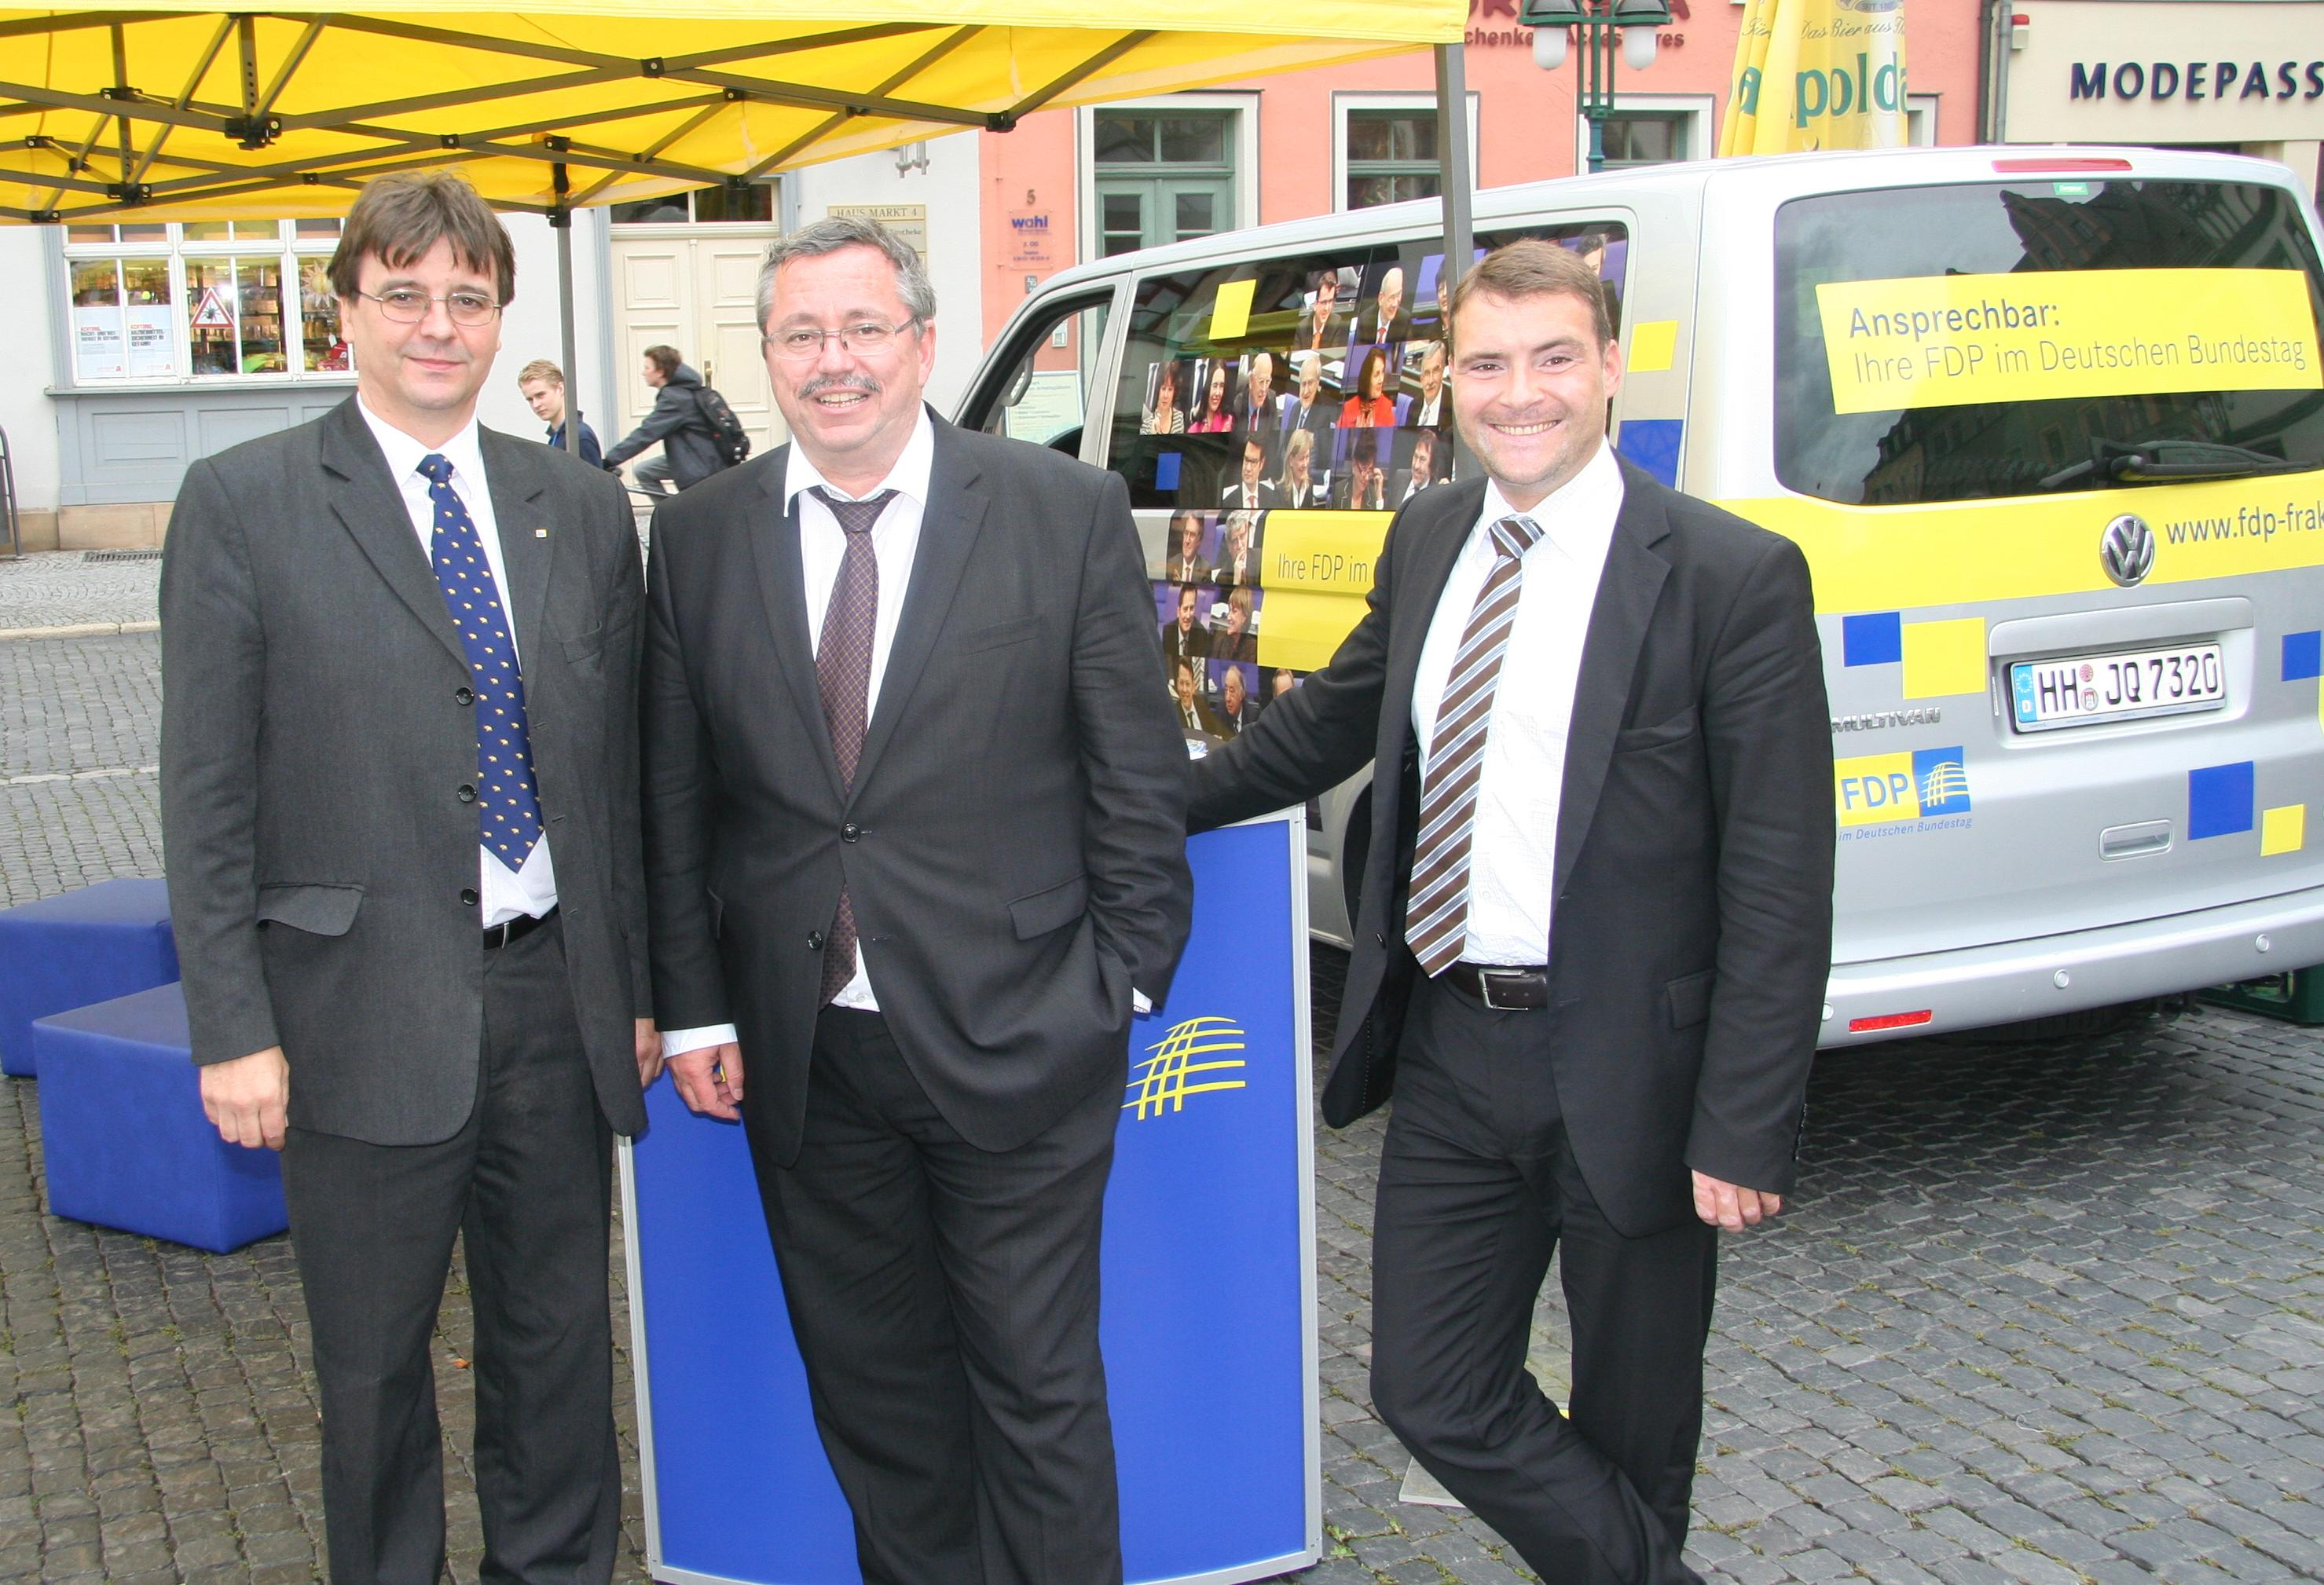 Matthias Pudel, Stefan Wolf (SPD), Patrick Kurth